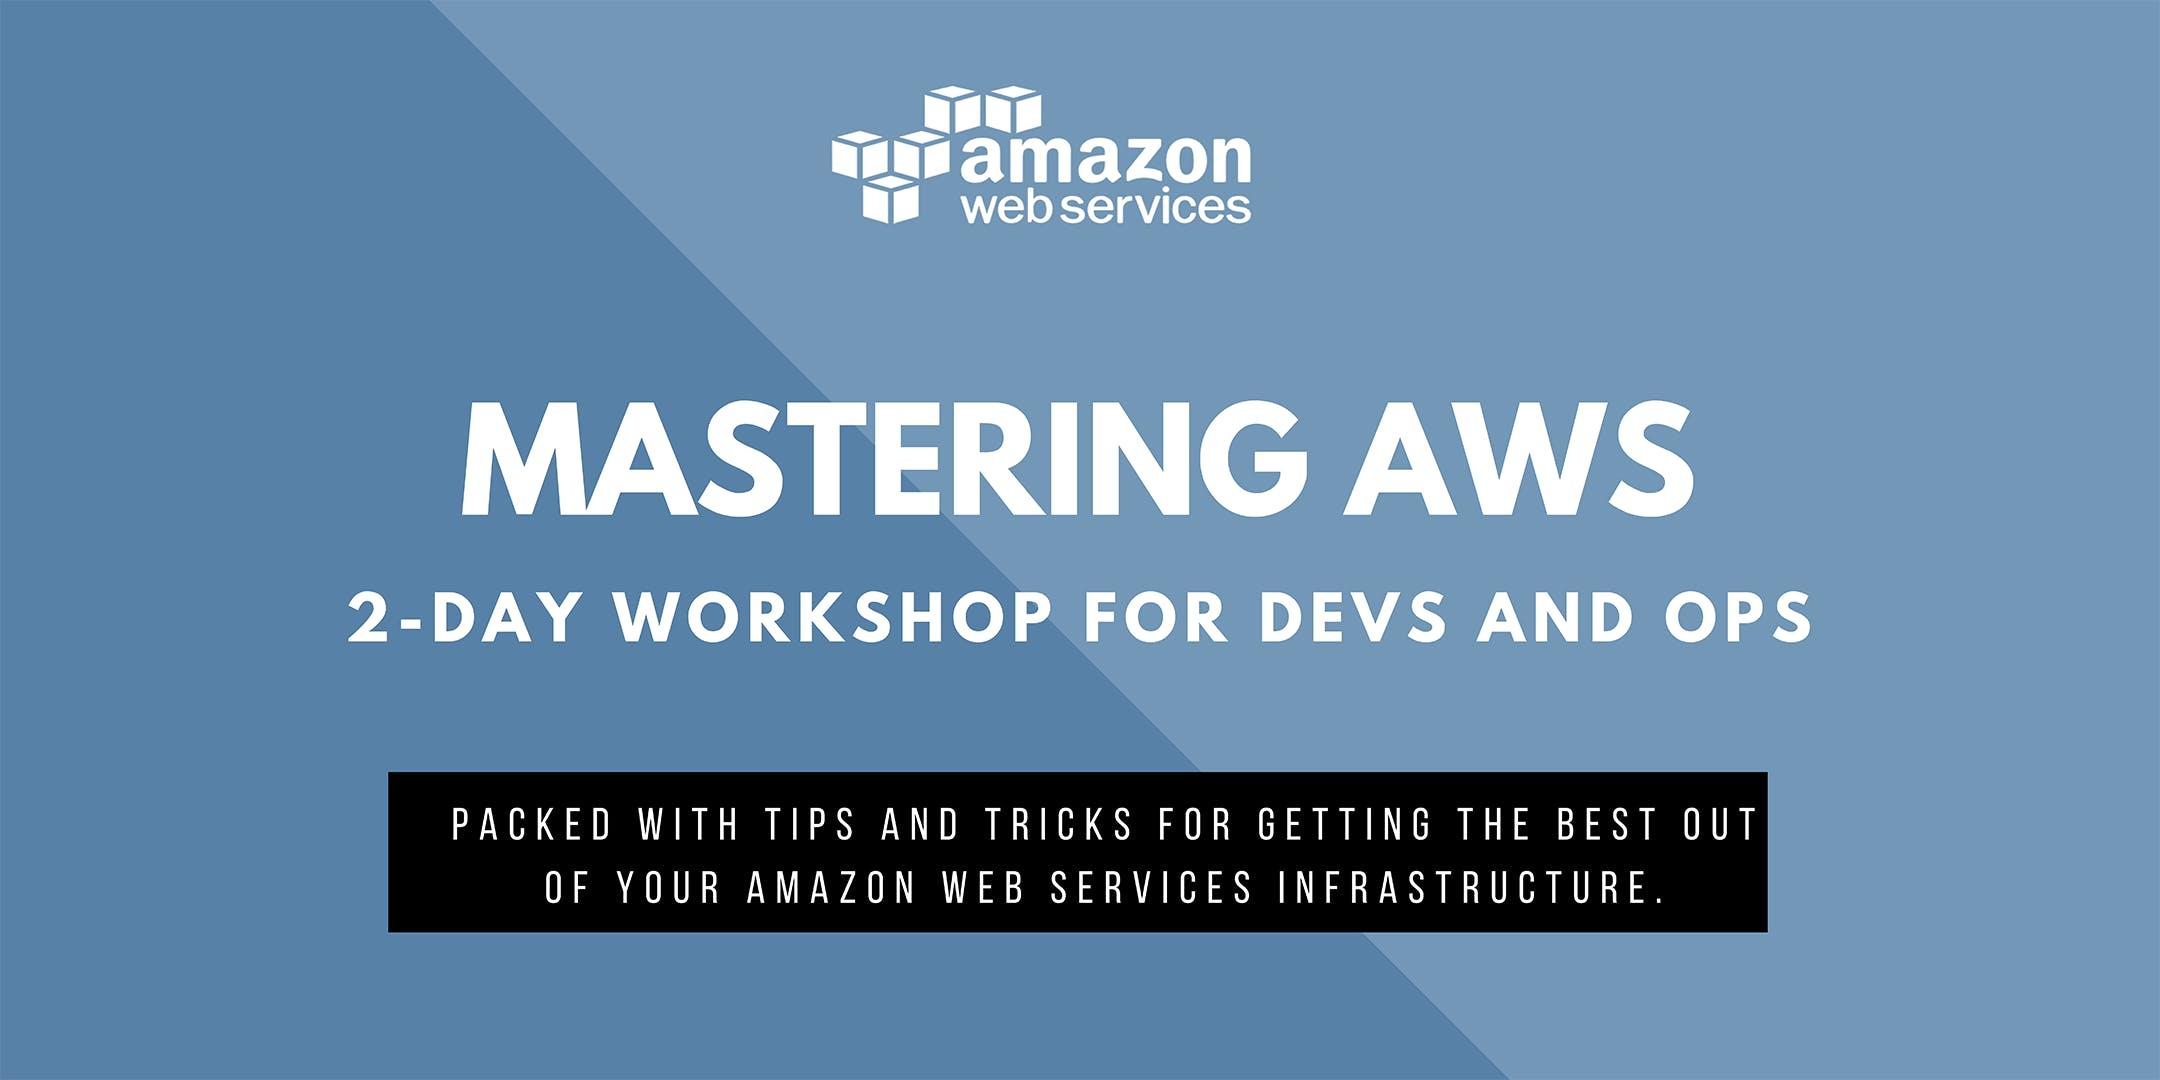 TOP Mastering Amazon Web Services (Prague)